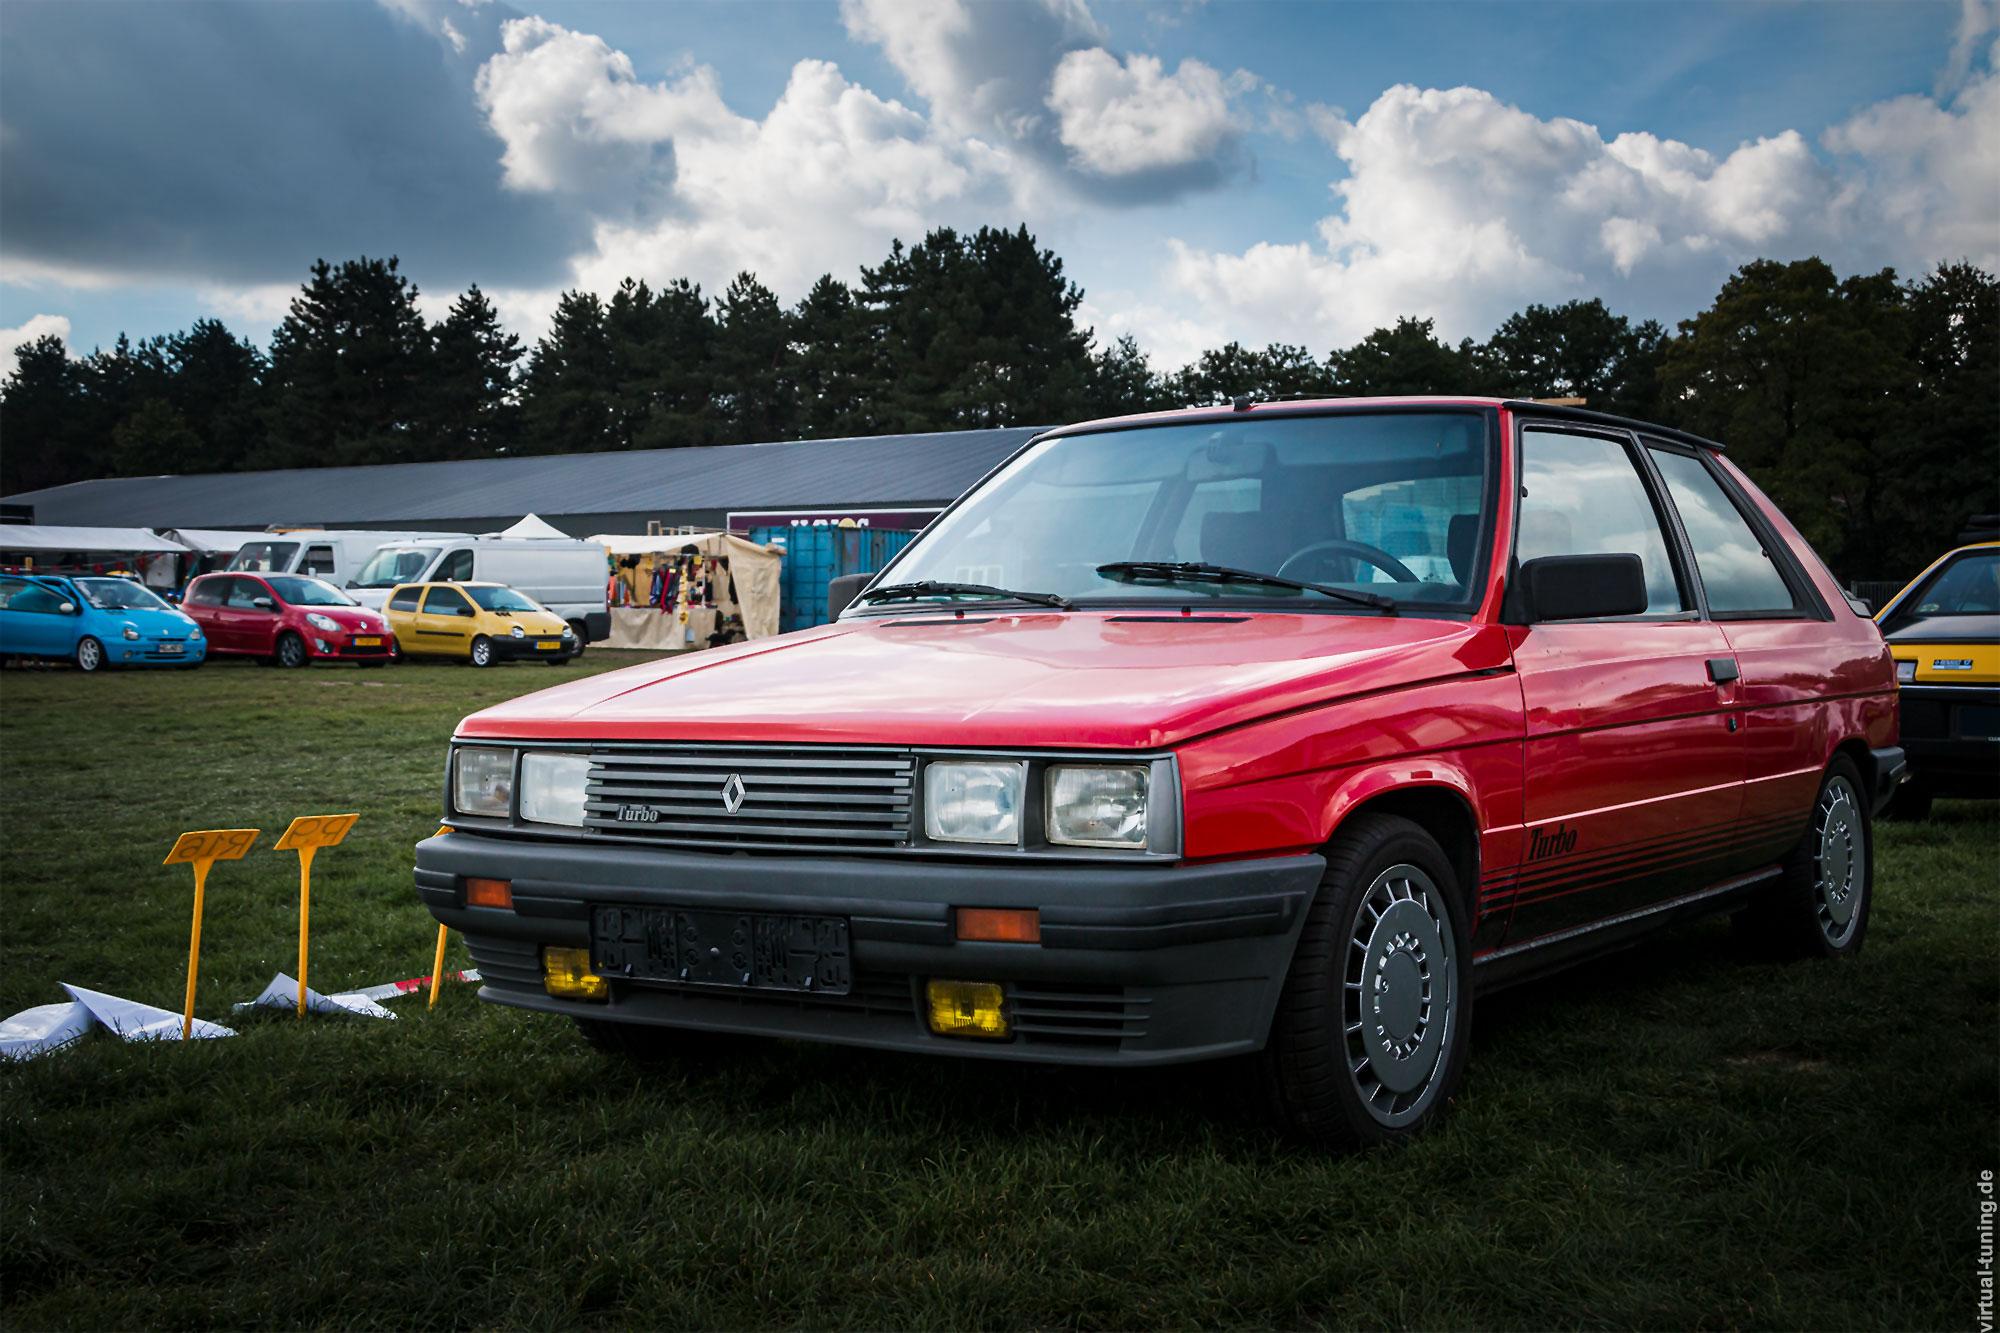 Renault 11 Turbo - 4e Fête Renaultoloog